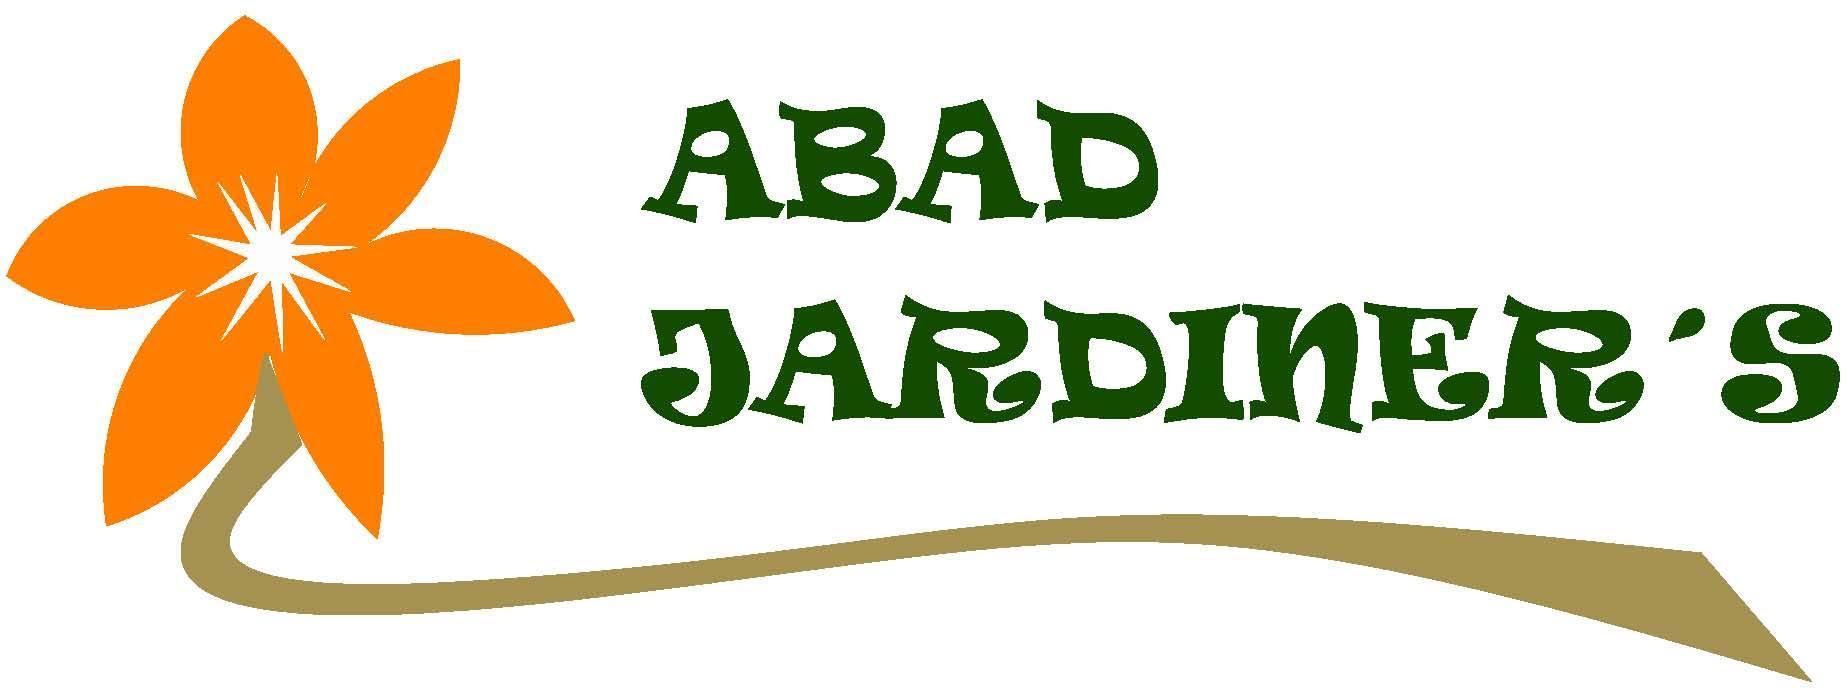 Abad Jardiners